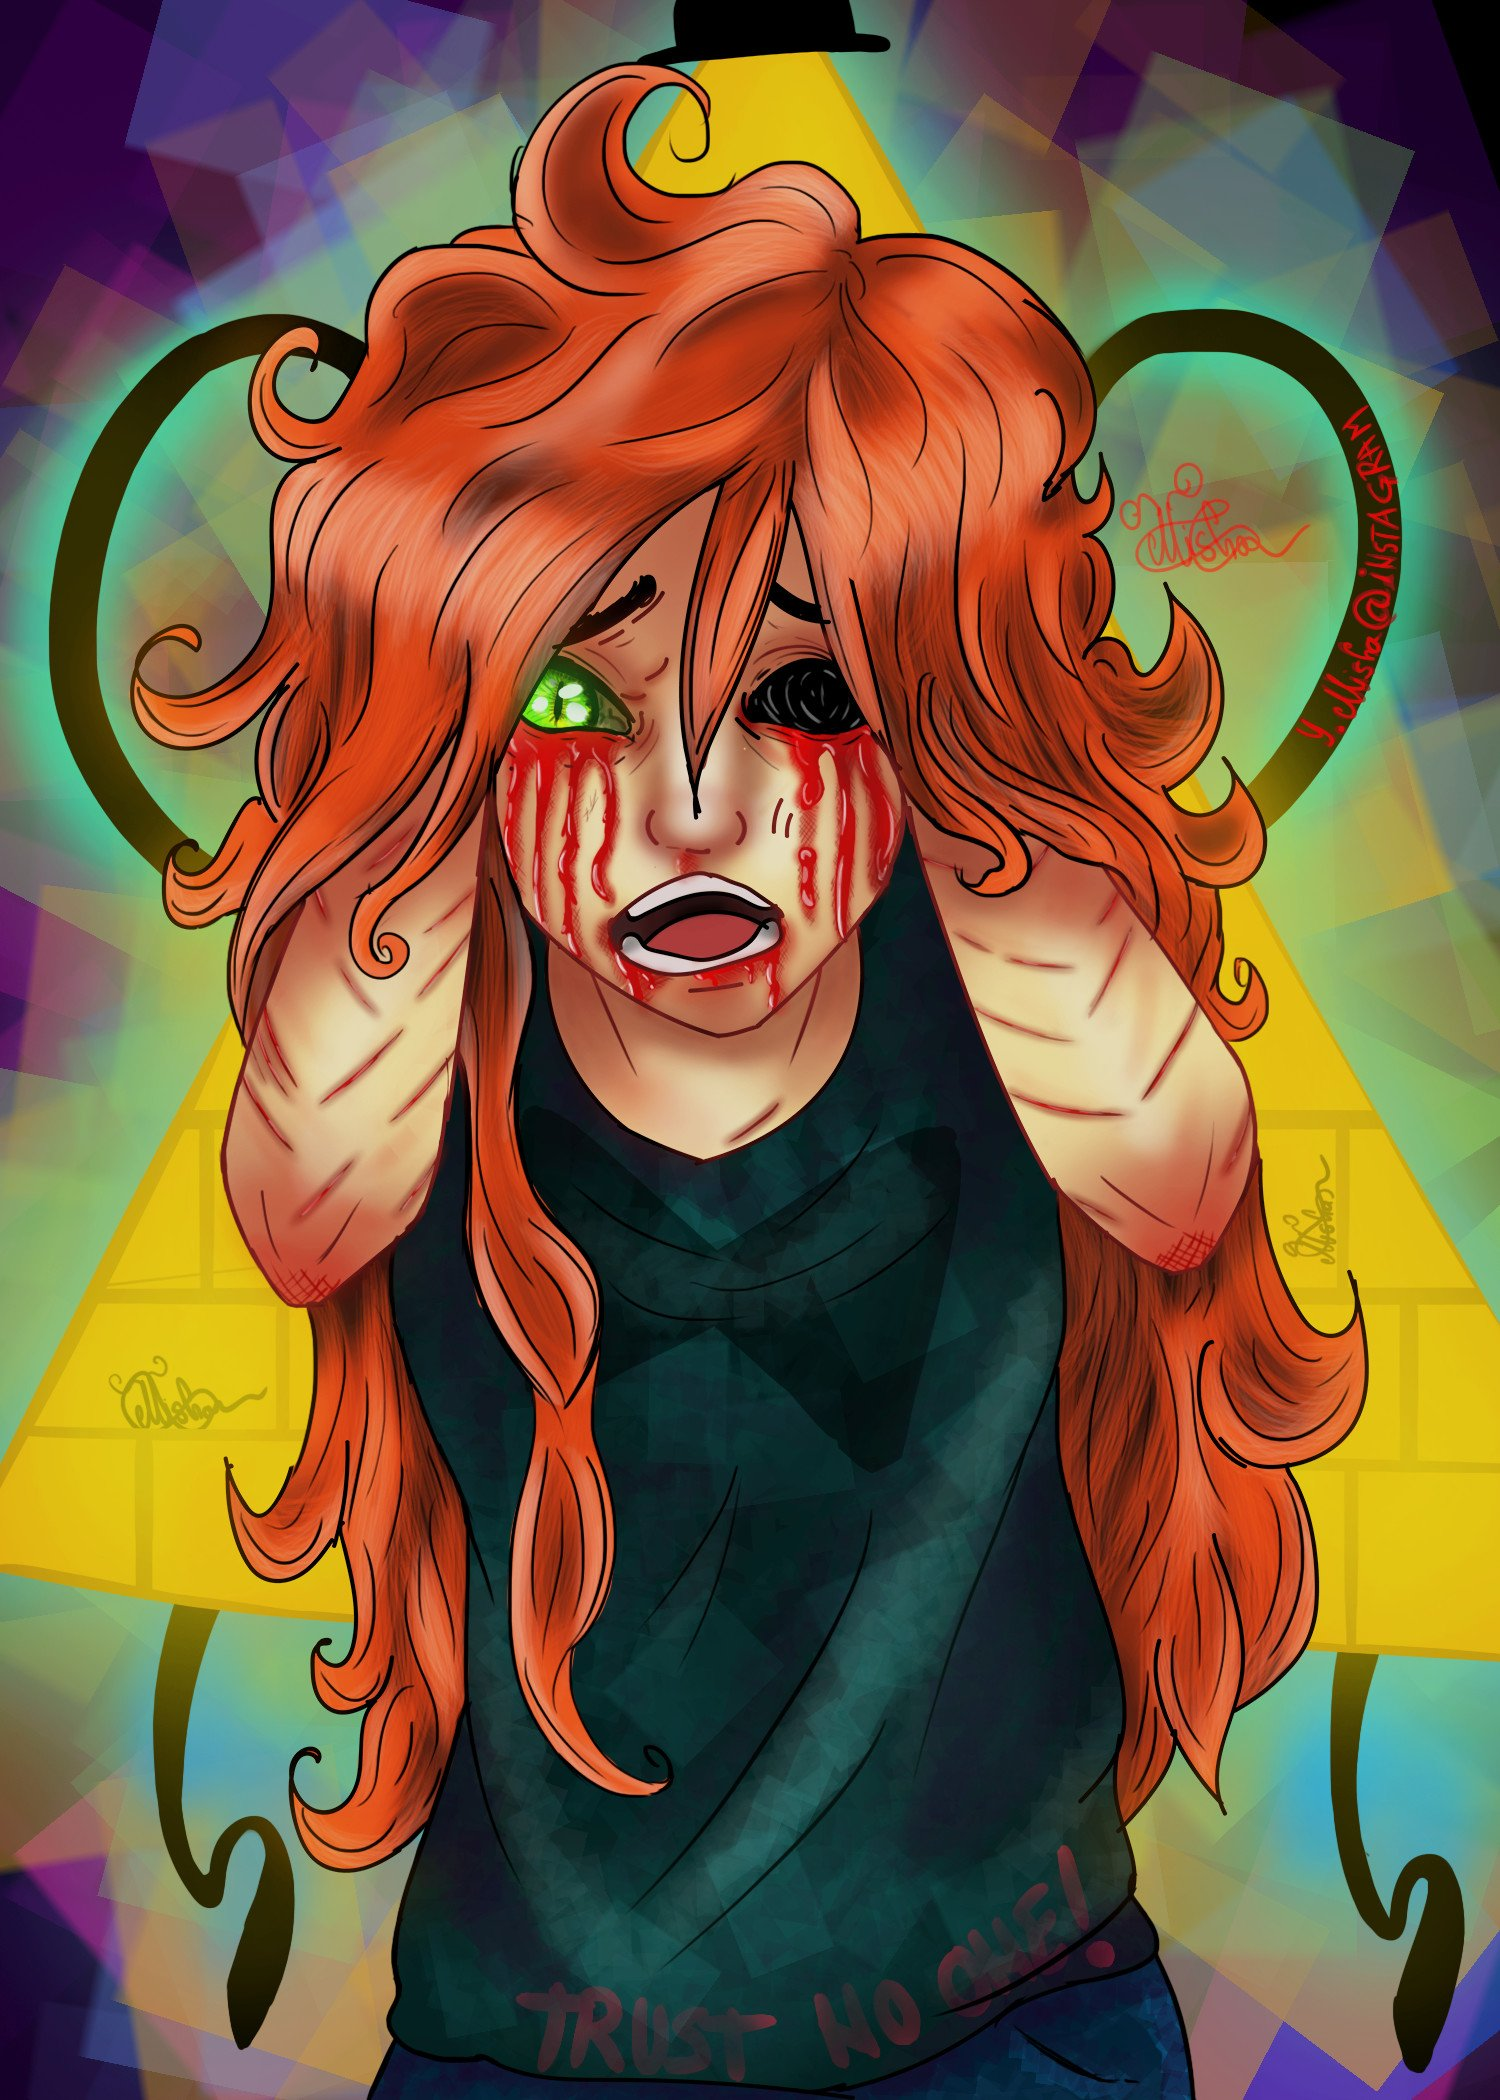 ArtStation - Wendy From Gravity Falls Poster